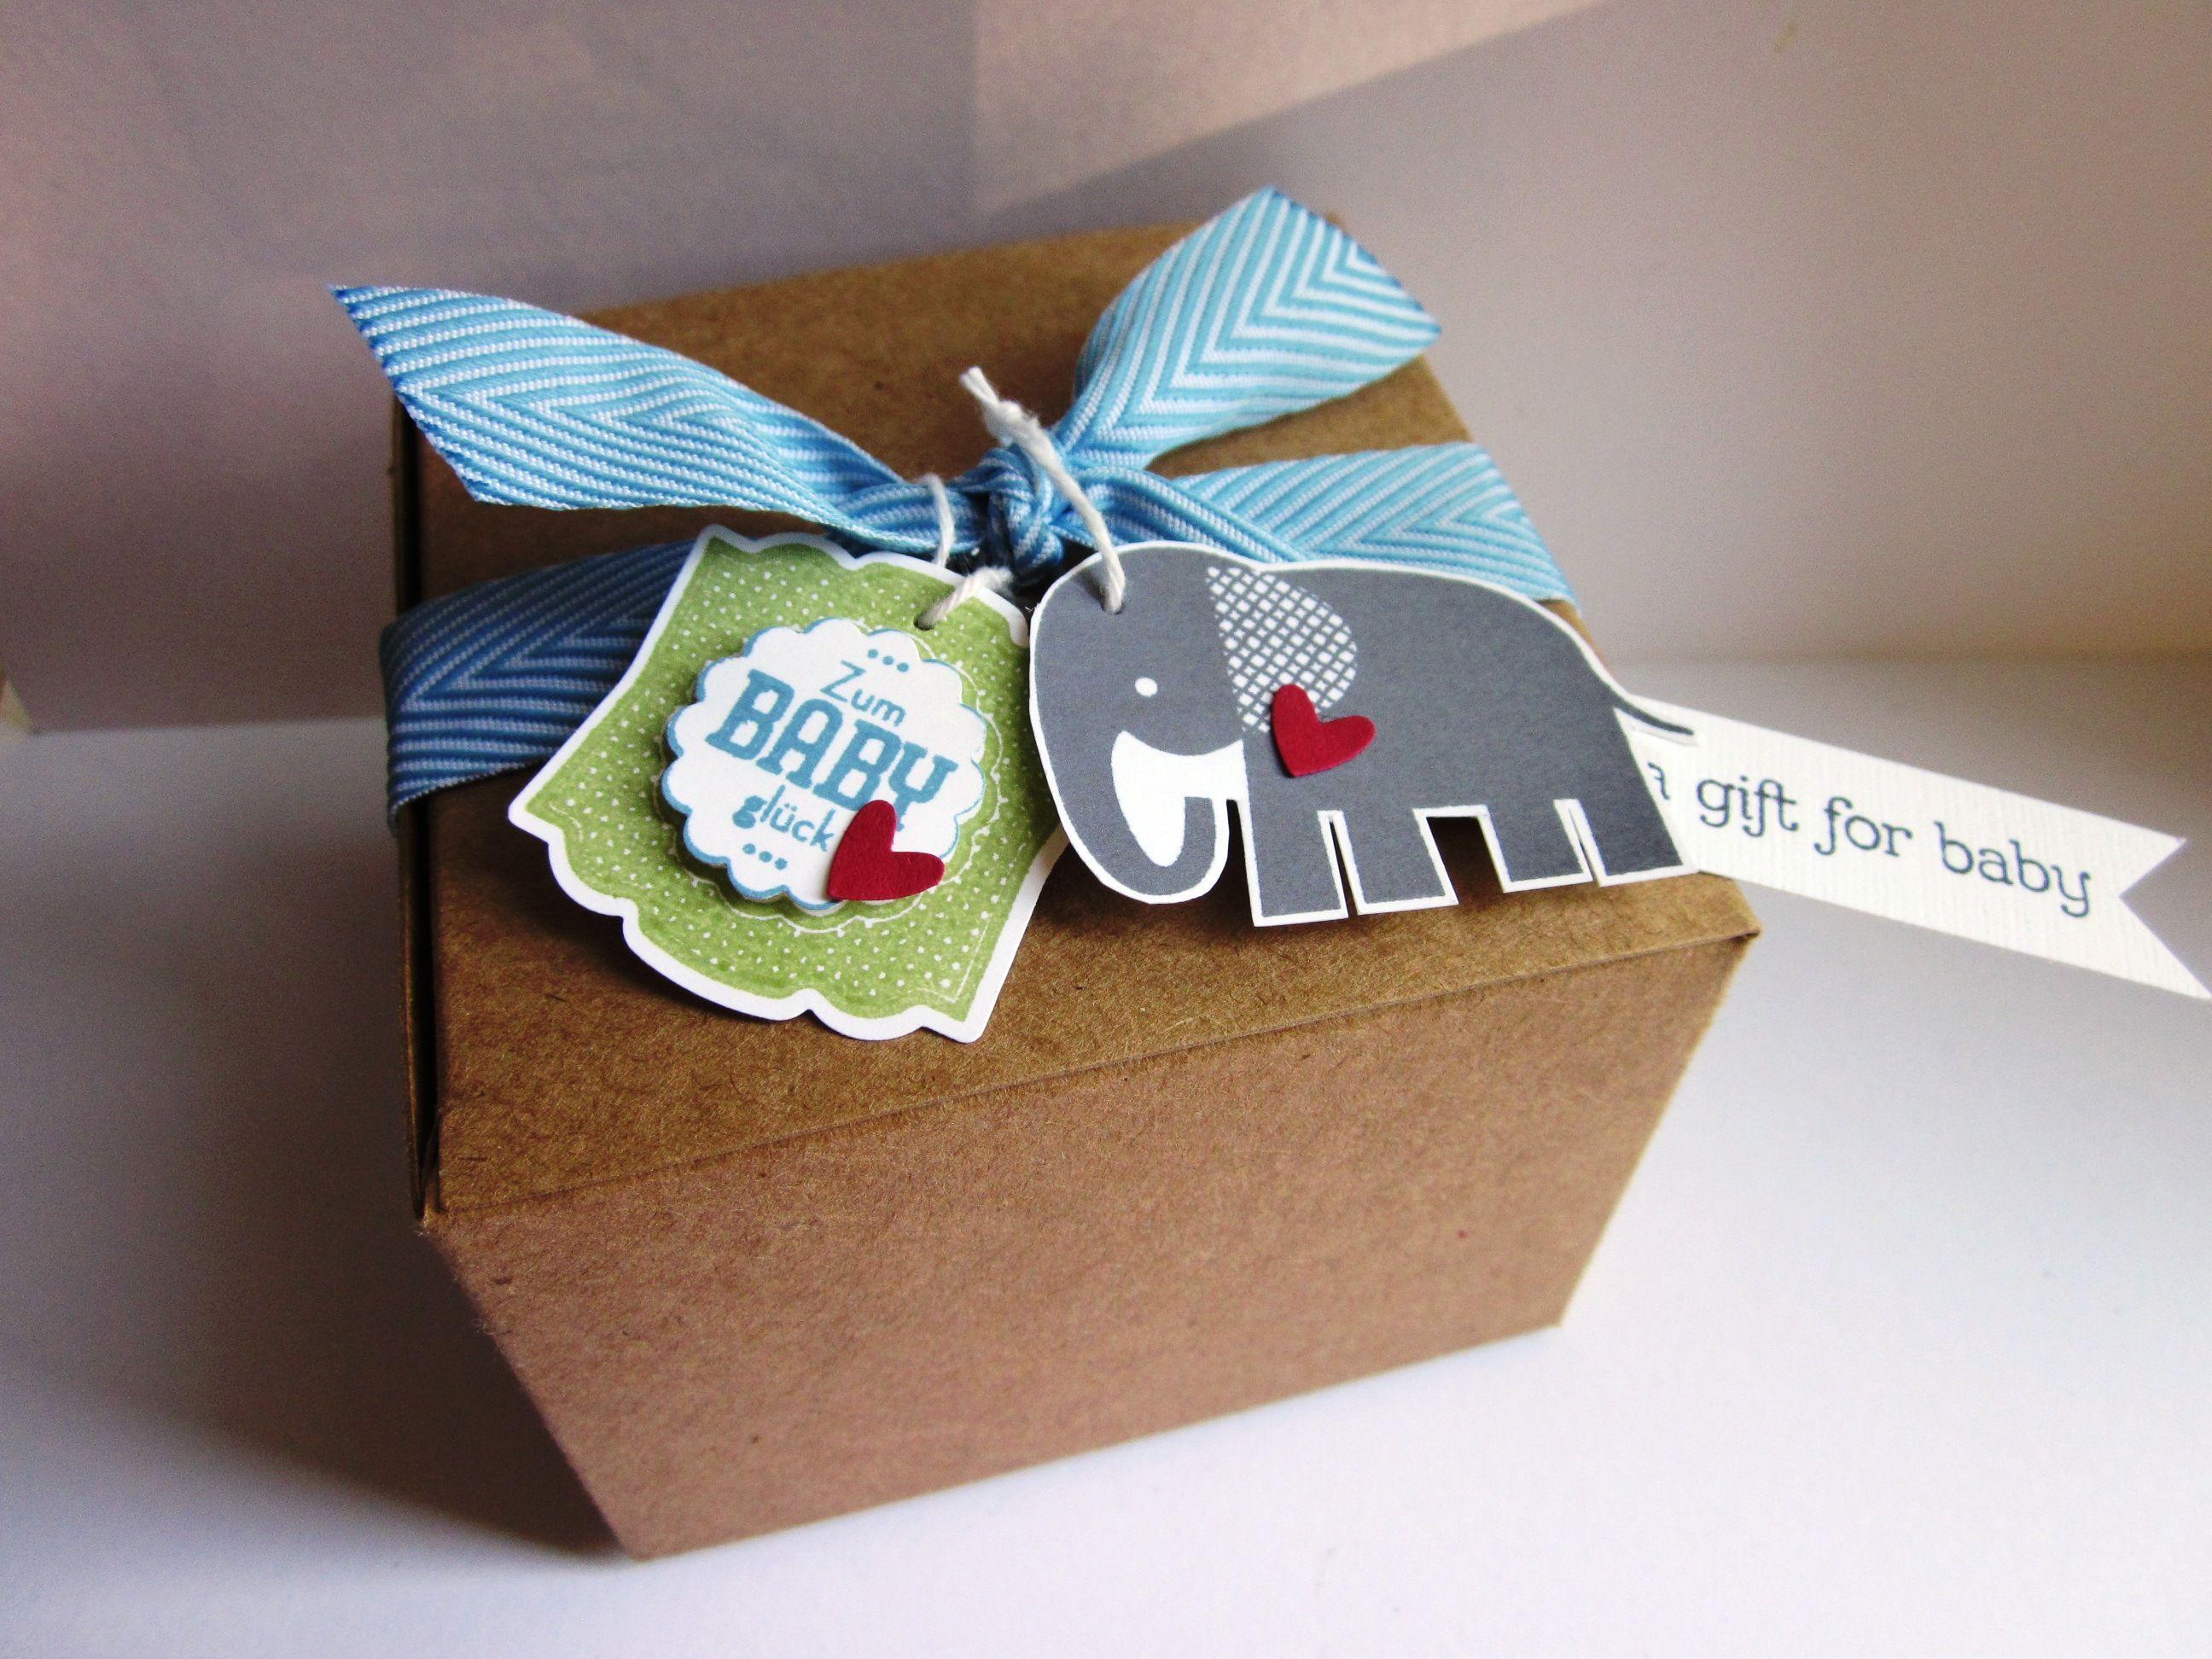 Stampin Up Verpackung für Babygeschenk Nett iketten Zoo Babies